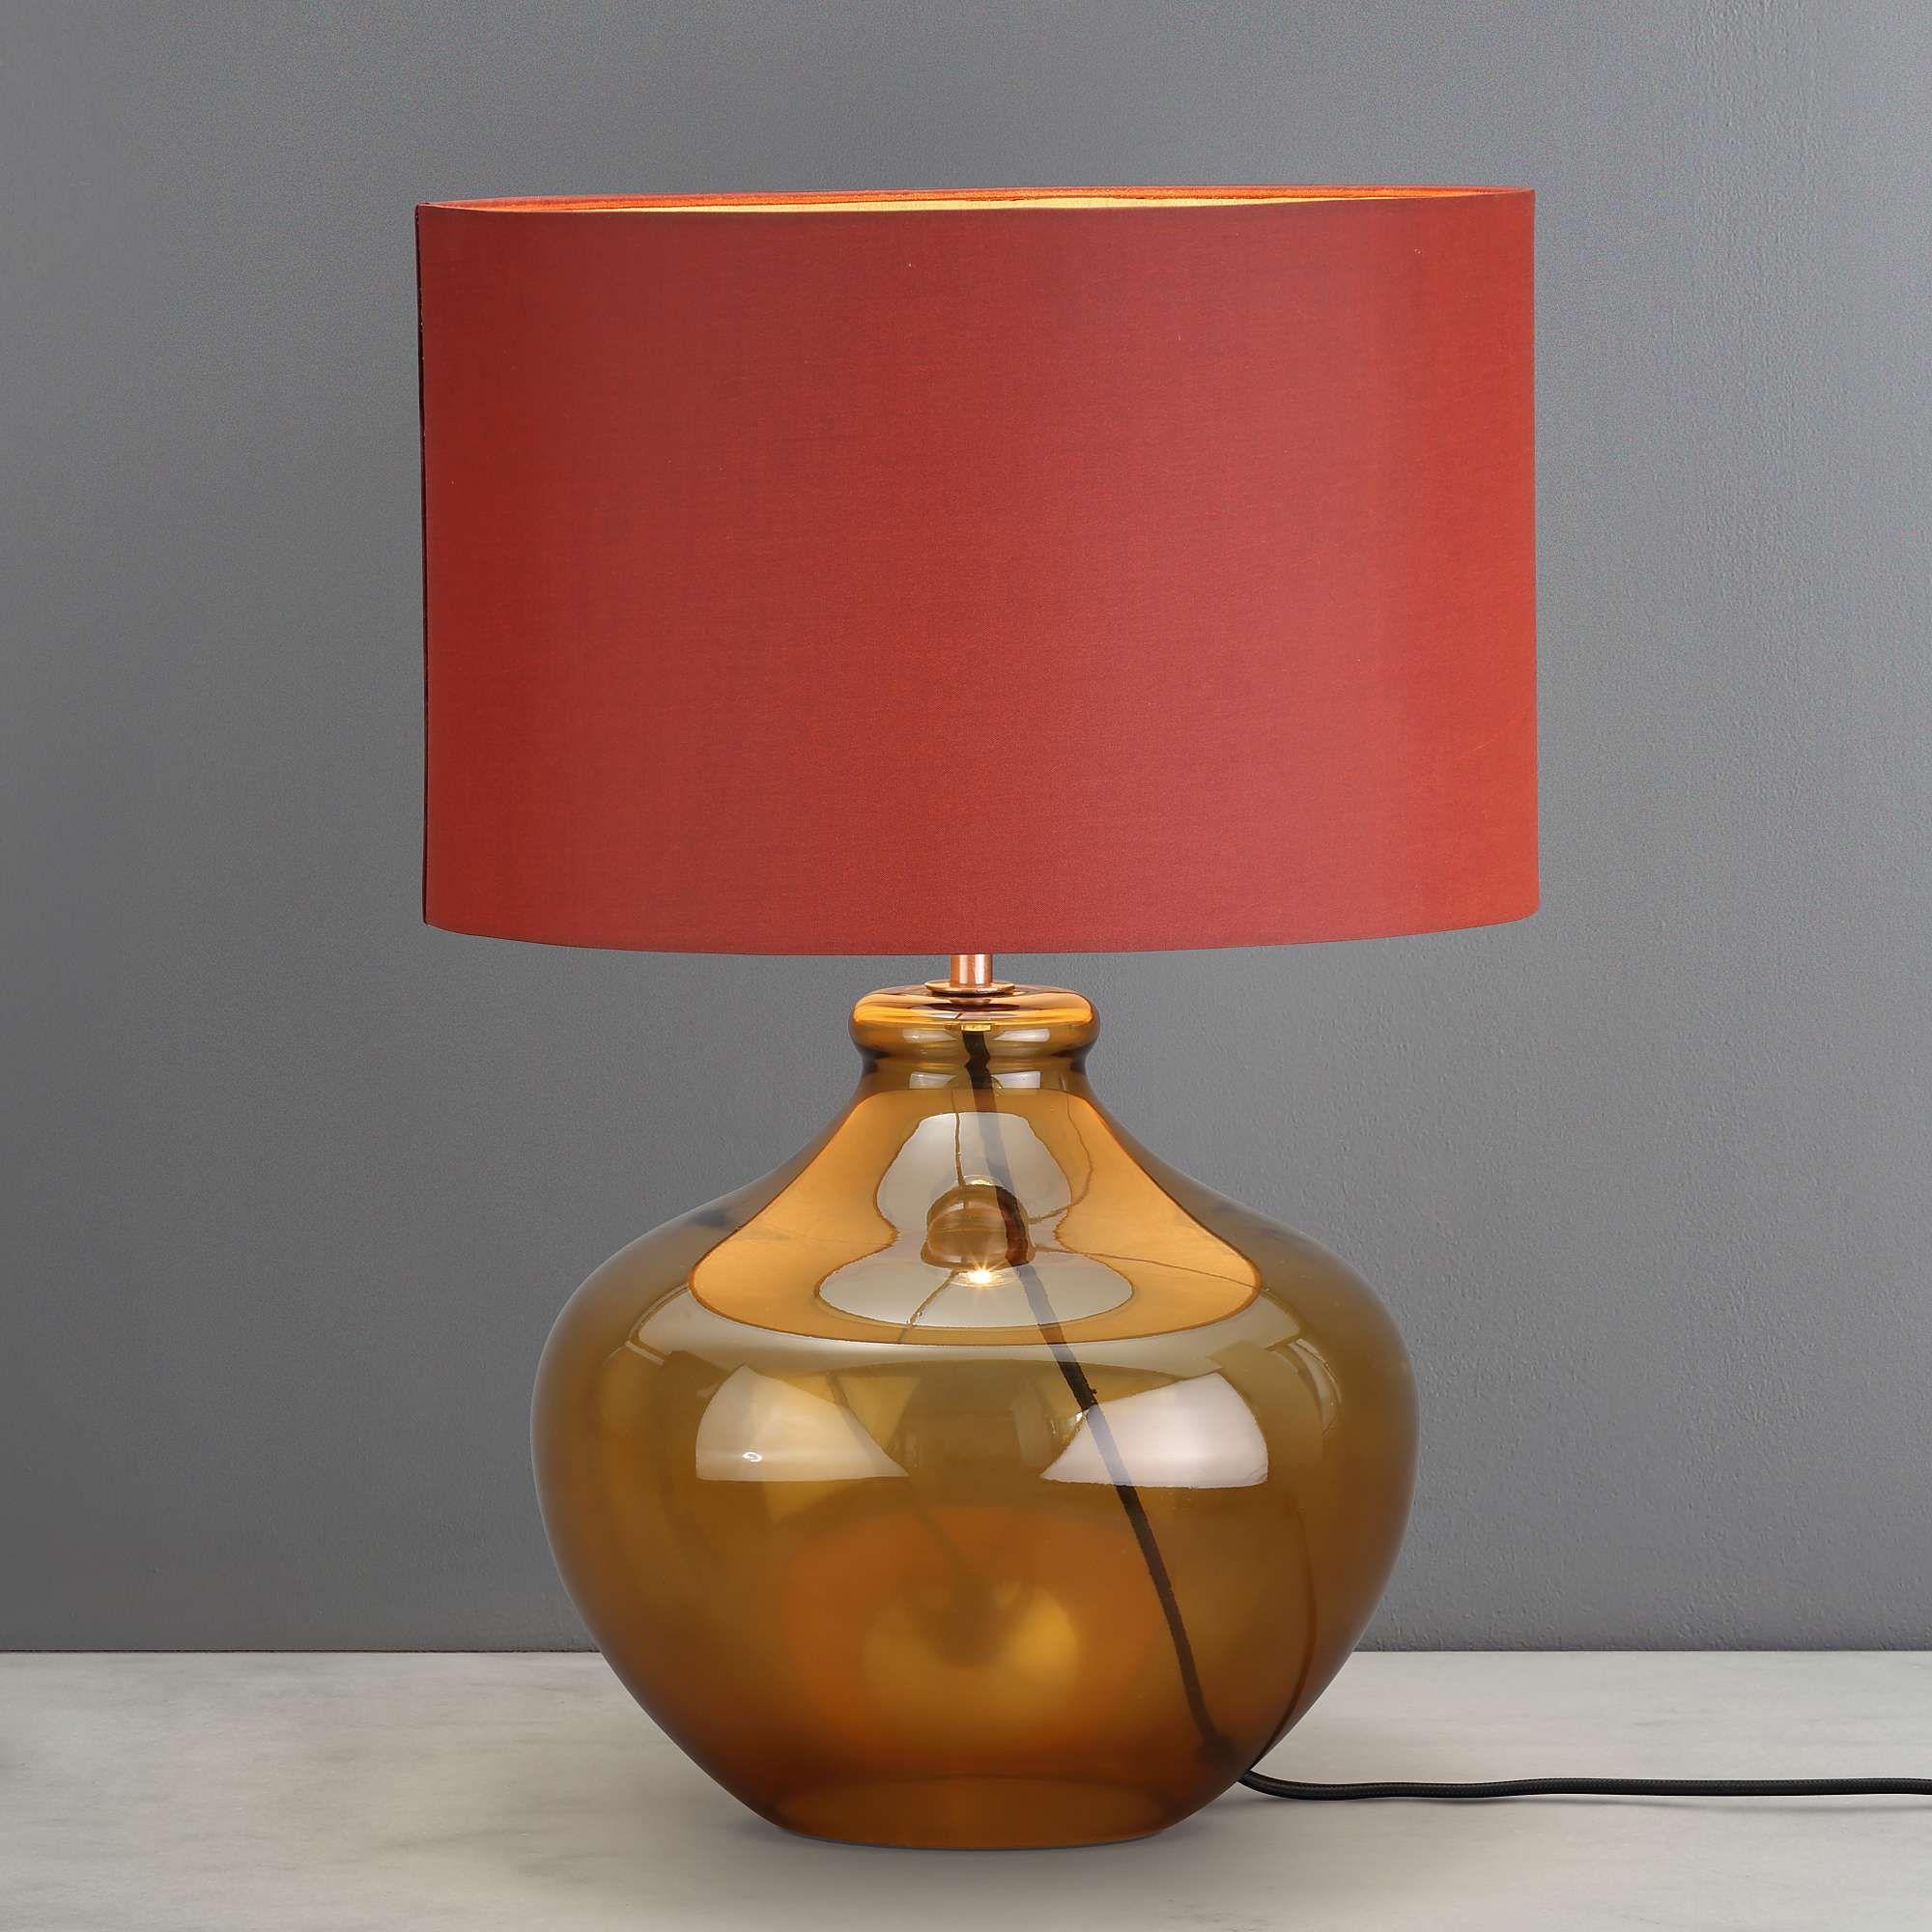 Miguel Caramel Glass Table Lamp Dunelm Lamp Lamps Tablelamp Tablelamps Desklamp Lighting Homedecor Decor Table Lamp Lamp Beautiful Table Lamp